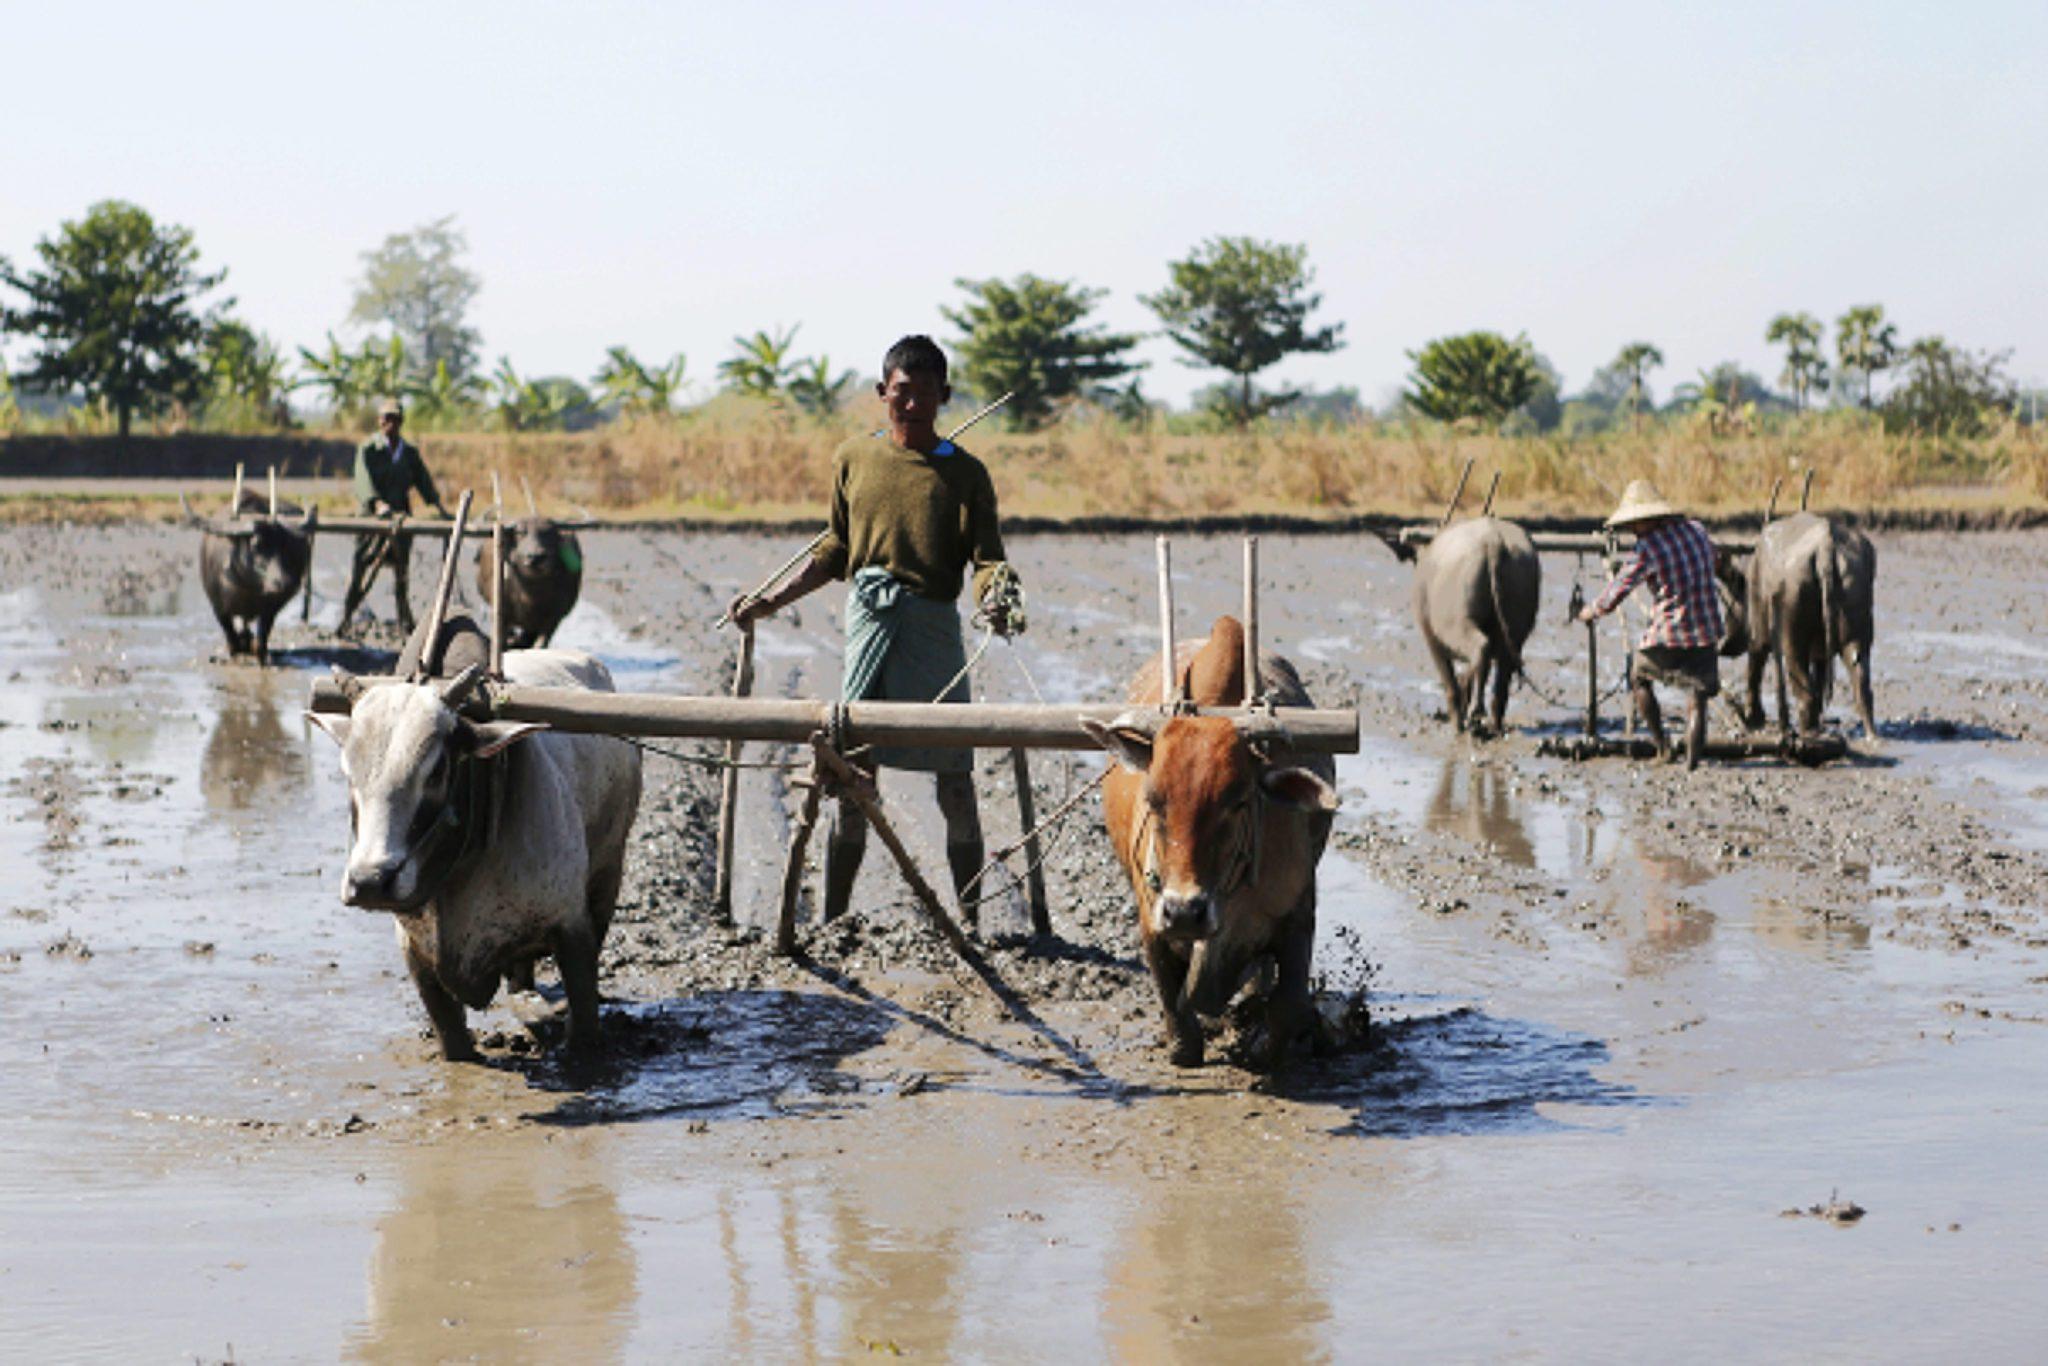 epa05721114 Farmers plough the land with bulls in Naypyitaw, Myanmar, 16 January 2017.  EPA/HEIN HTET Dostawca: PAP/EPA.